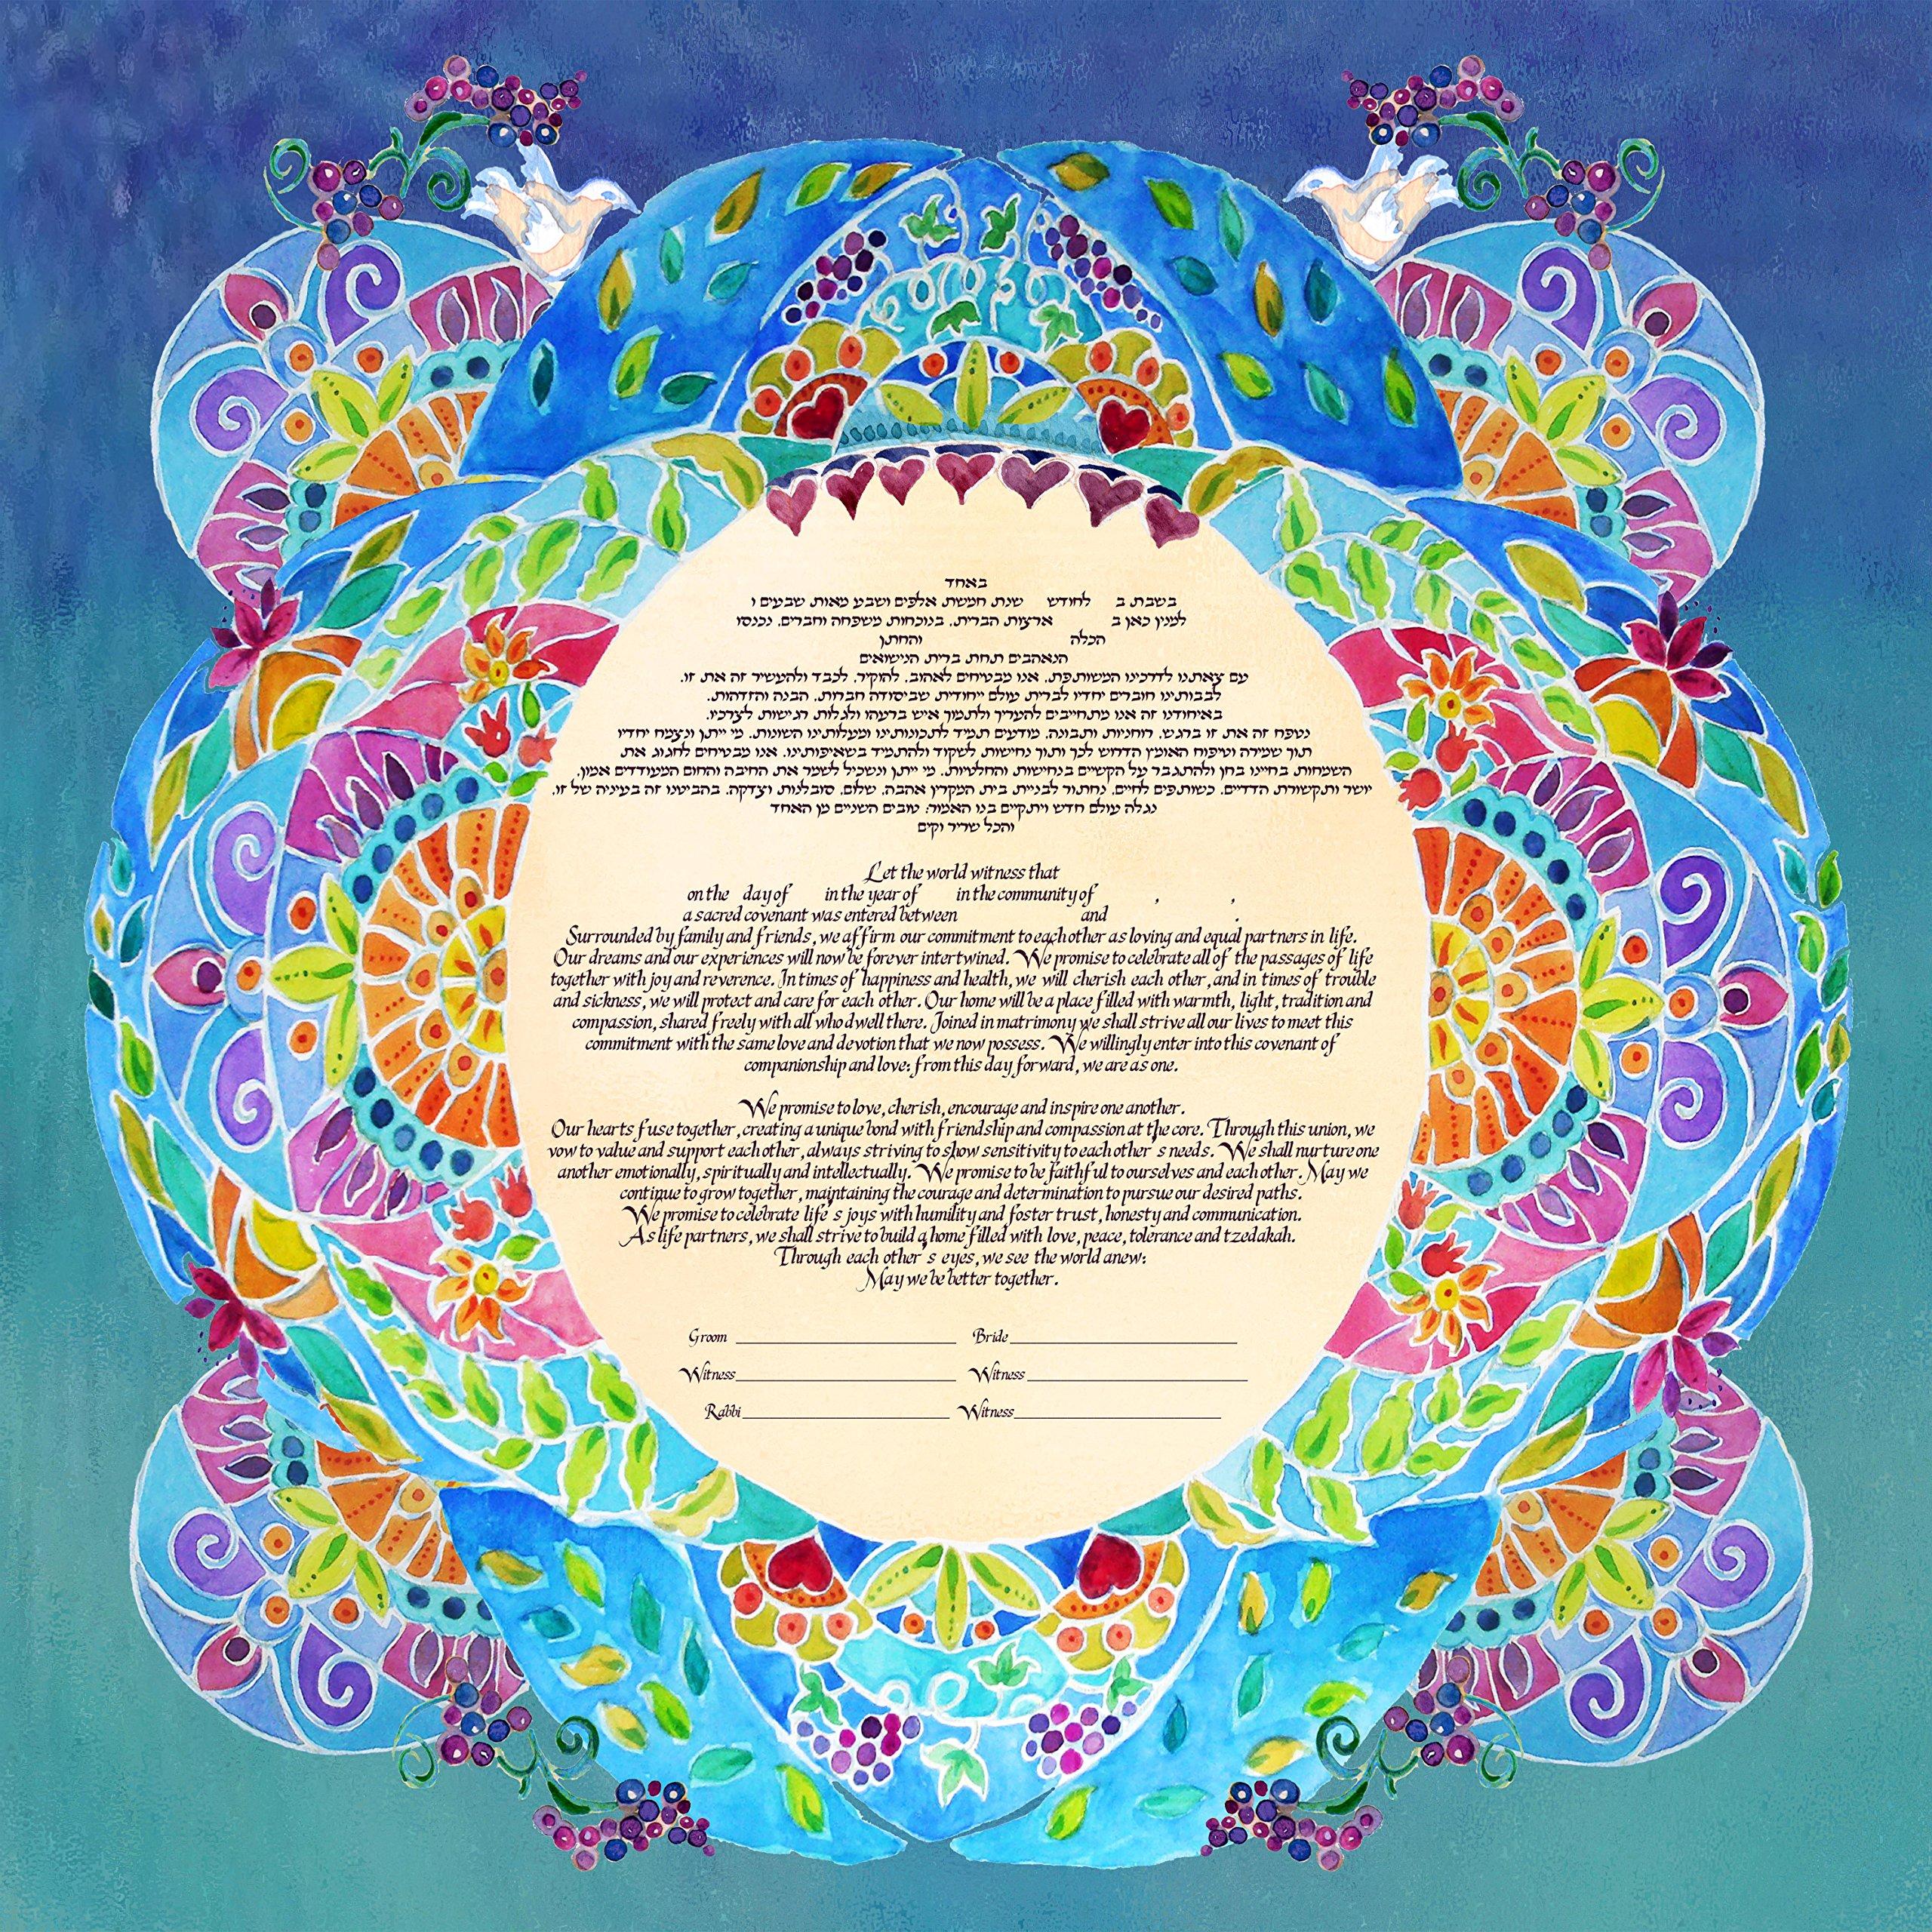 Custom Ketubah - Jewish Wedding Contract - Personalized Ketubah - Jewish Judaica Art - Hebrew English - Hearts Mandala